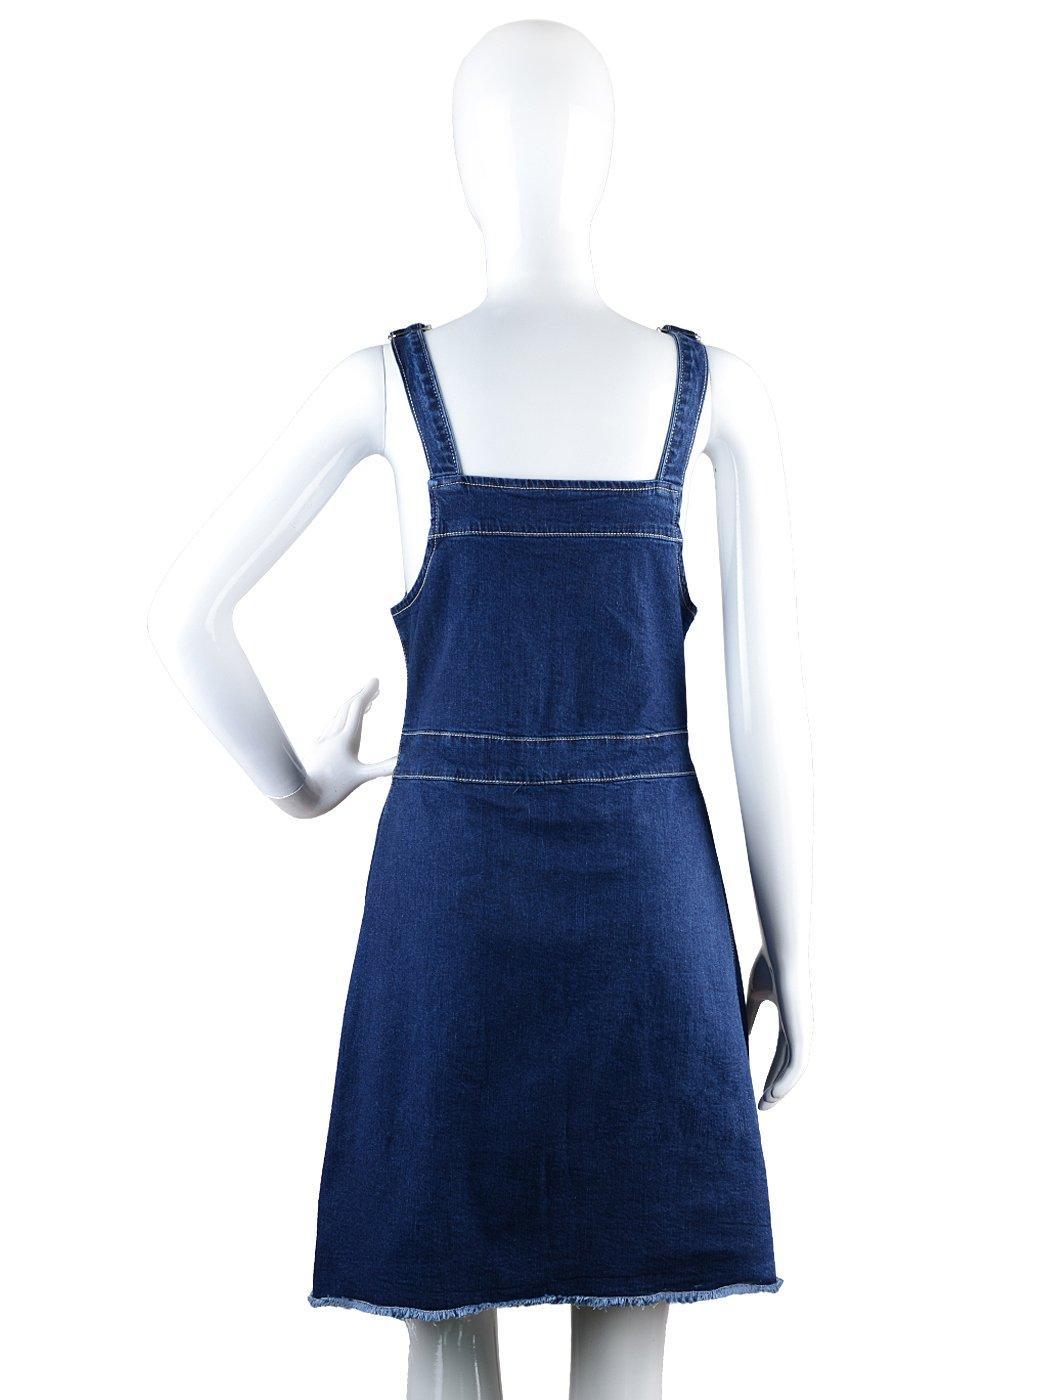 490ddf078b7 Anna-Kaci Womens 90s Fashion Adjustable Strap Denim Jean Overall Dress